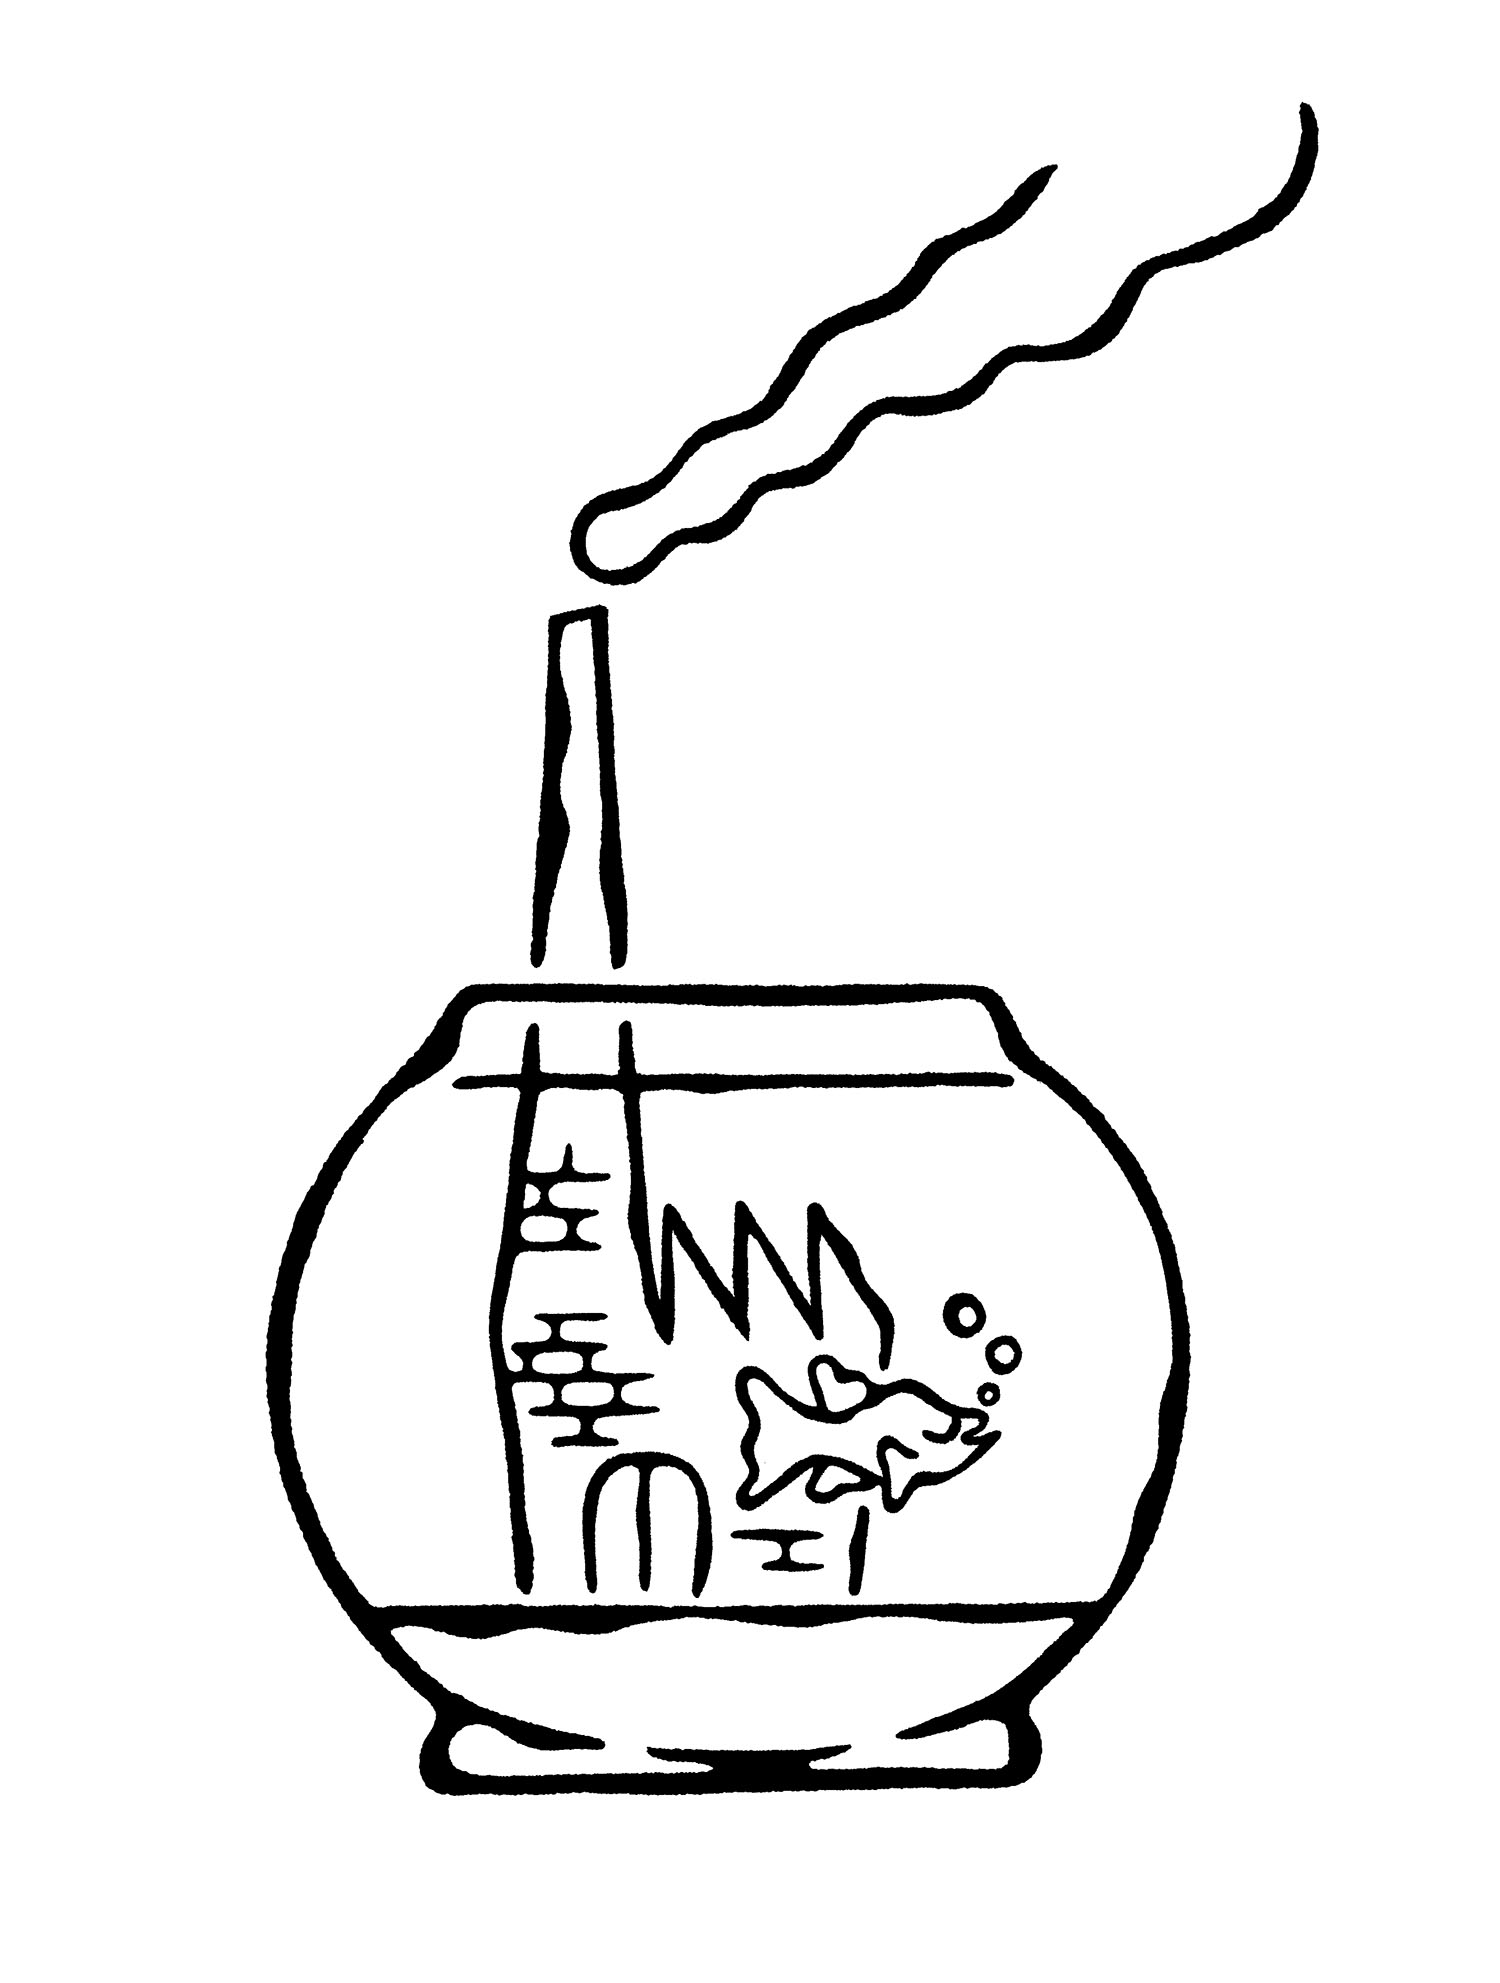 Patrik Mollwing Art & Illustration ◀ Overview